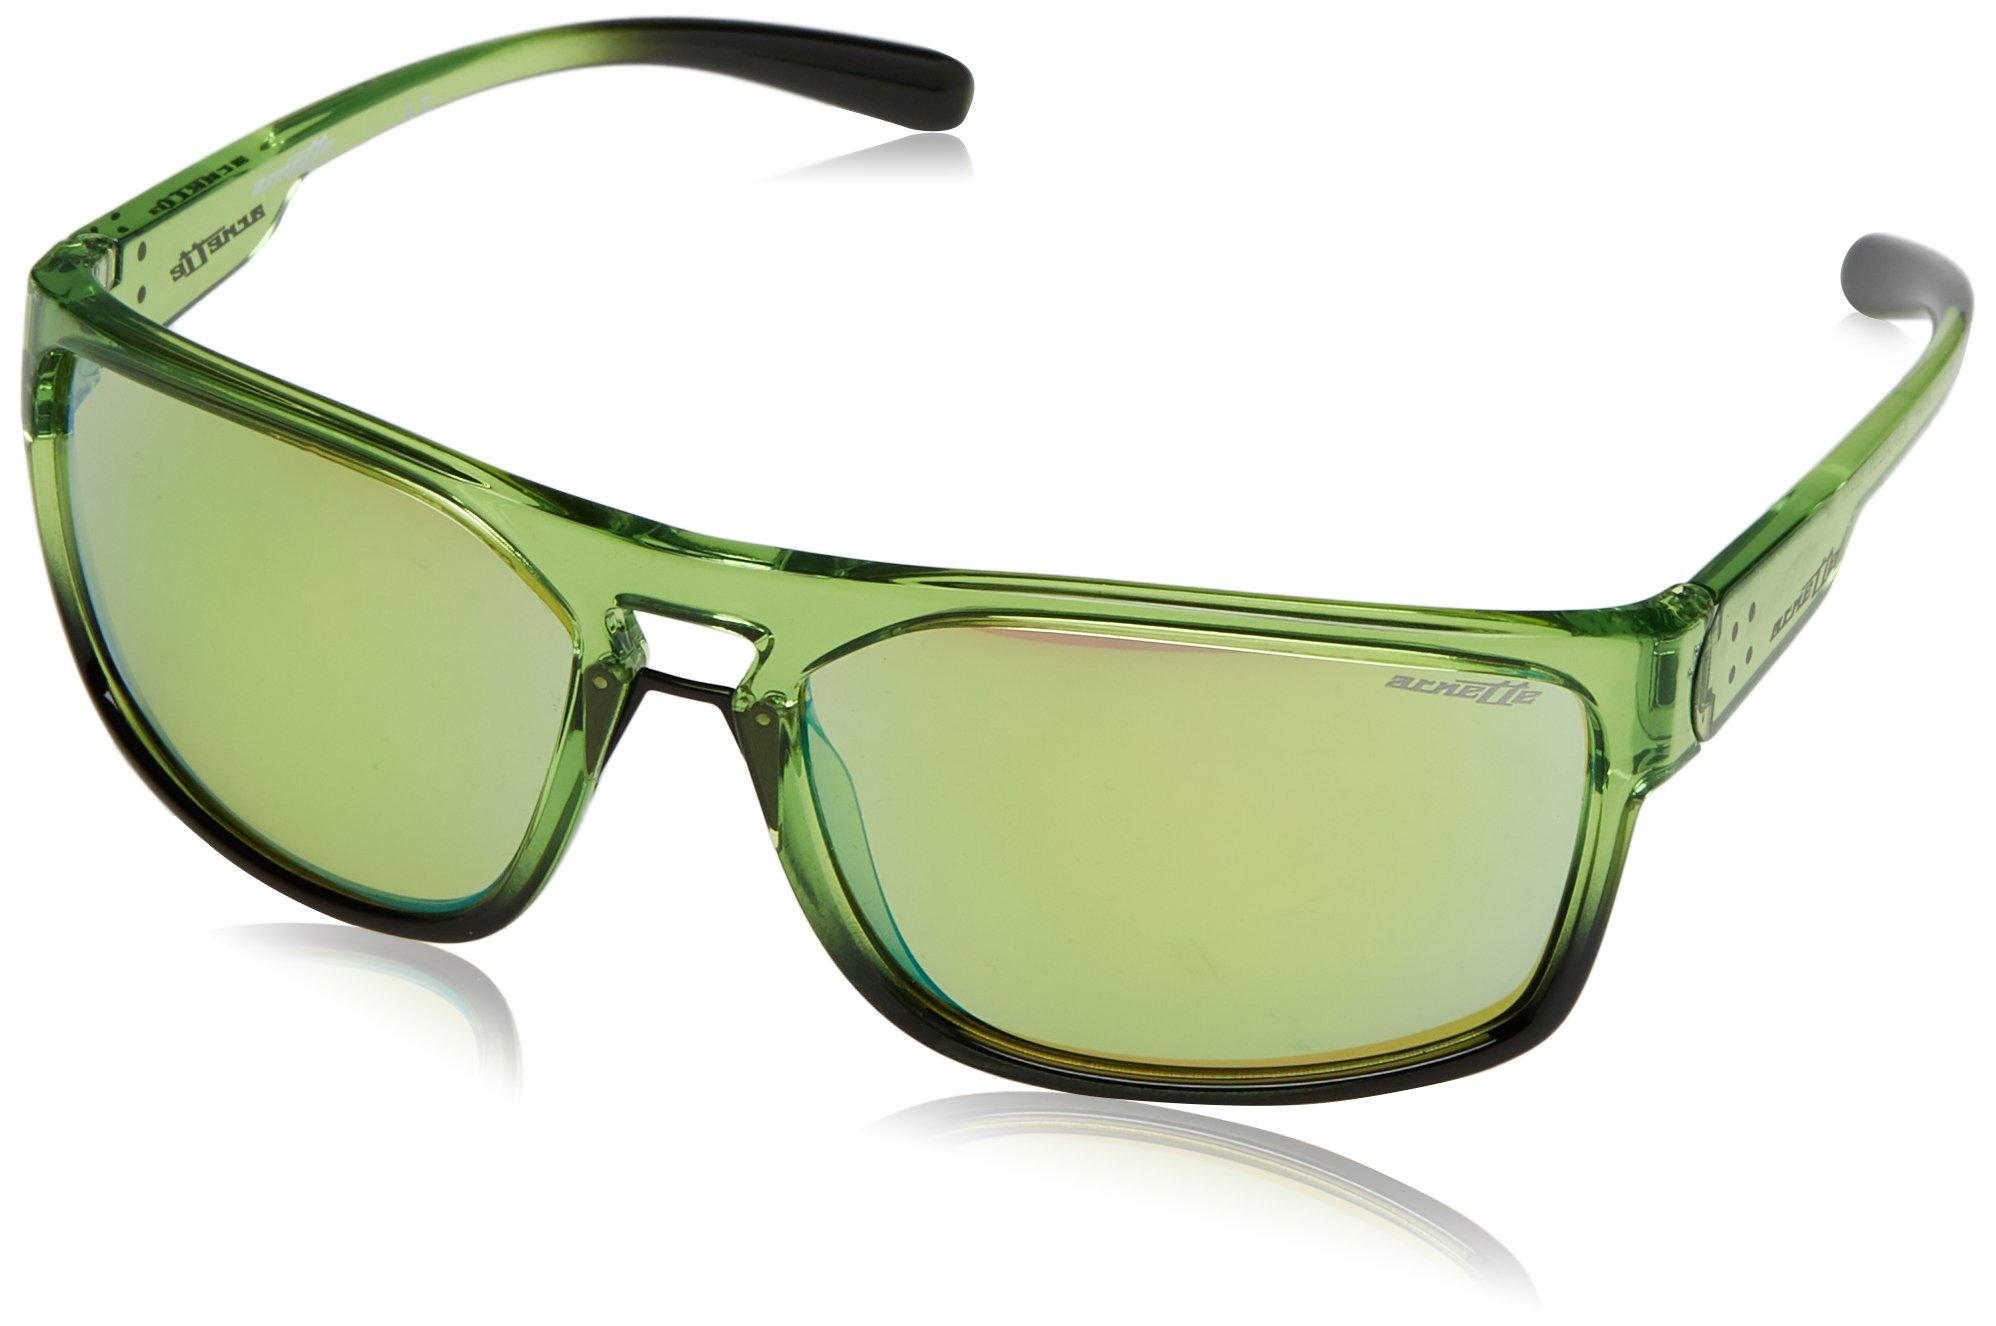 5674c6a1e4f Get Quotations · Arnette Men s Brapp Non-Polarized Iridium Rectangular  Sunglasses